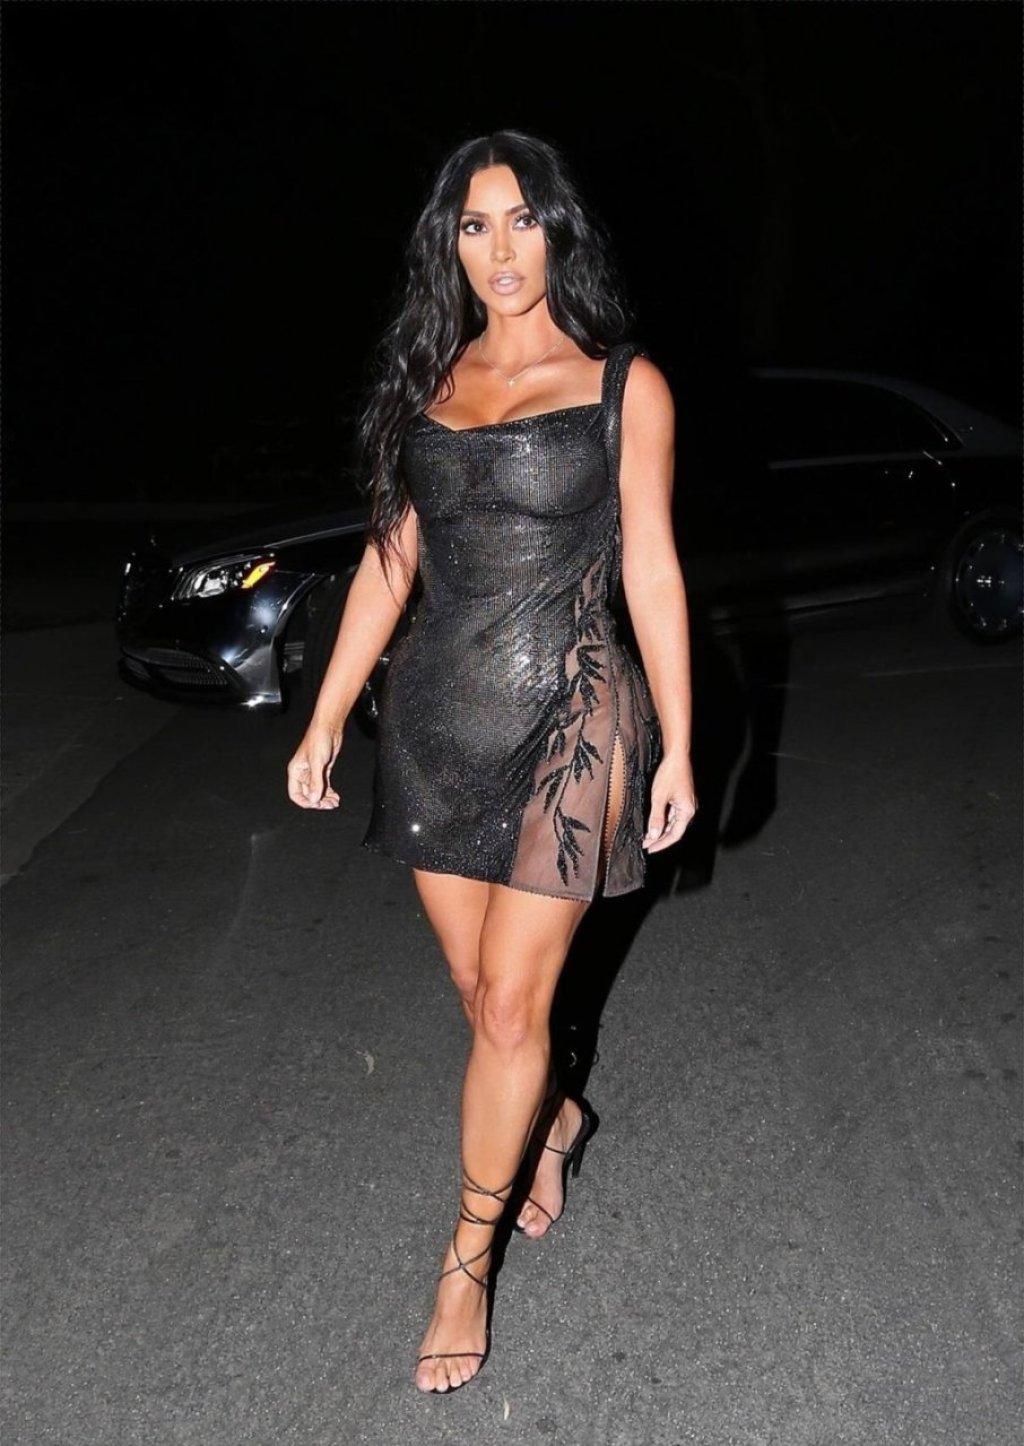 Kim Kardashian See Through (5 Hot Photos)